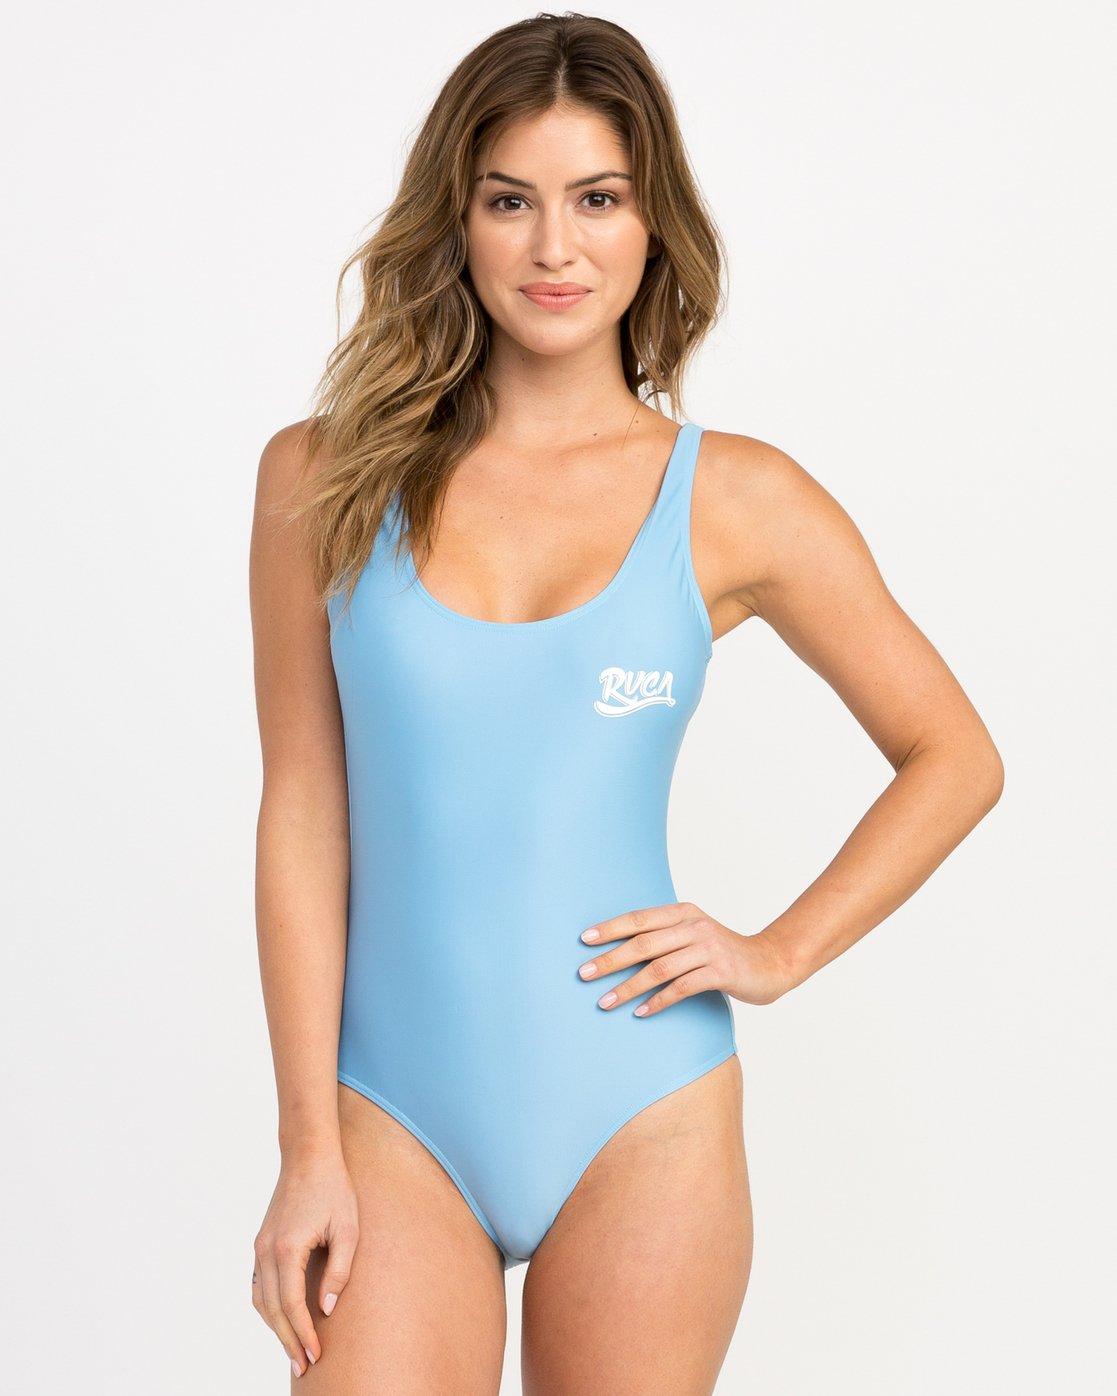 bd548e710b7 0 Shark One Piece Swimsuit Blue X102PRSO RVCA